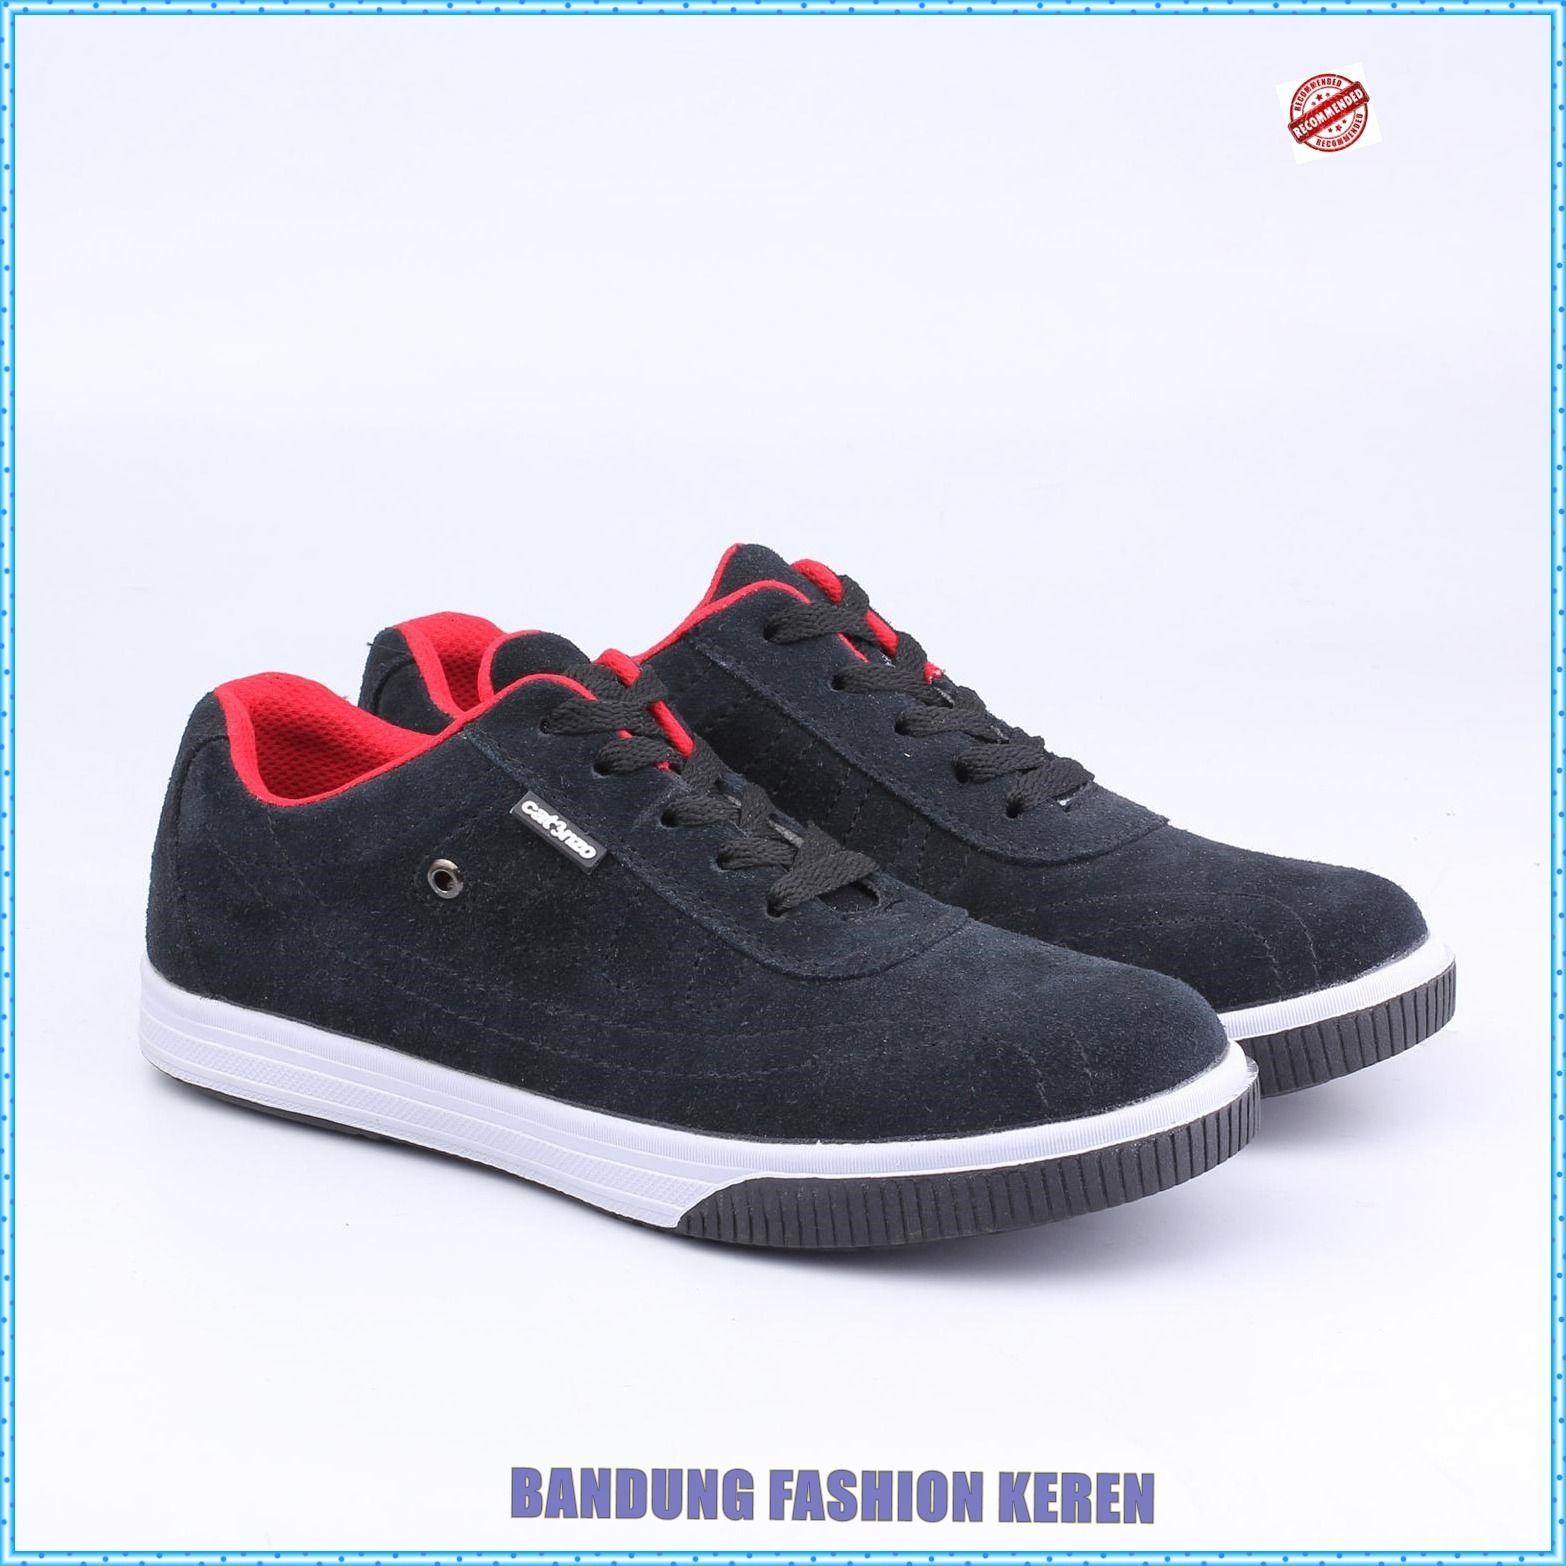 Sepatu Sport Pria Tf 088 Produk Fashion Handmade Terbaik 100